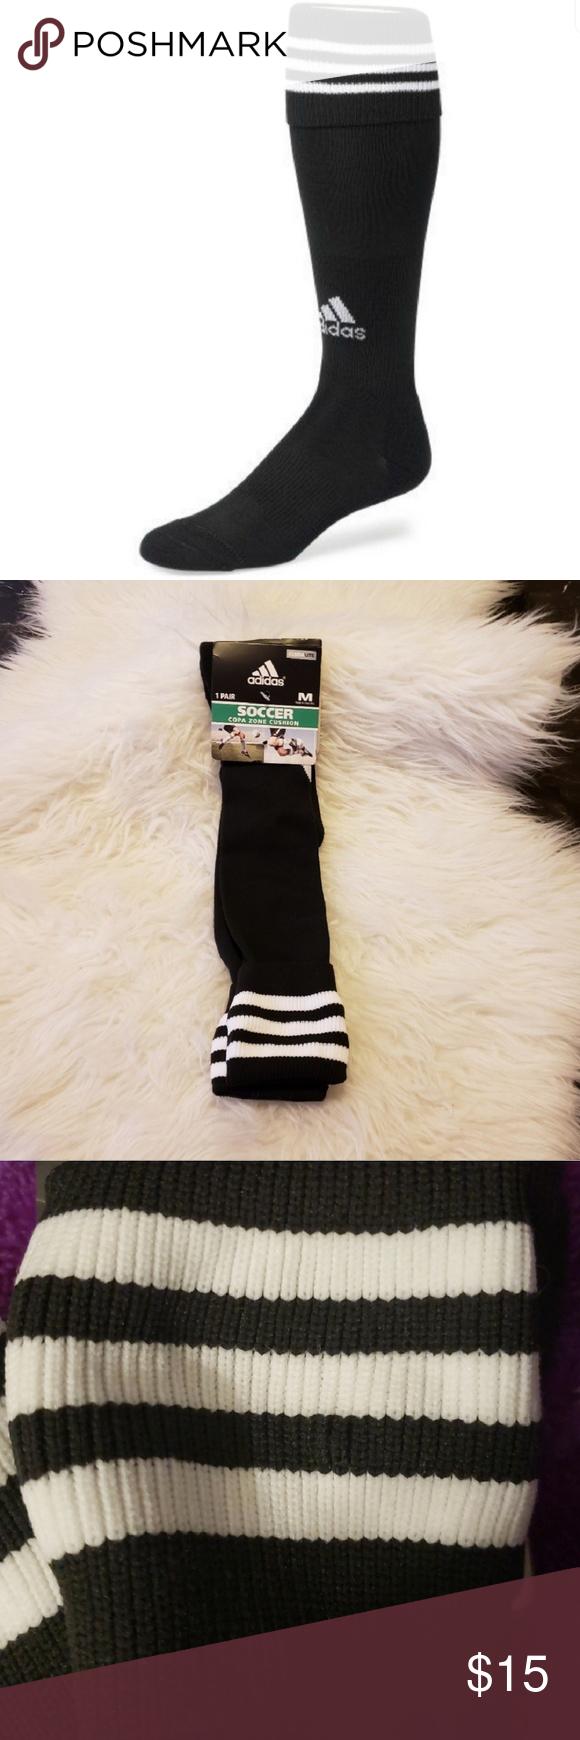 NWT Unisex Adidas Copa Zone Cushion Soccer Socks Shoe Size